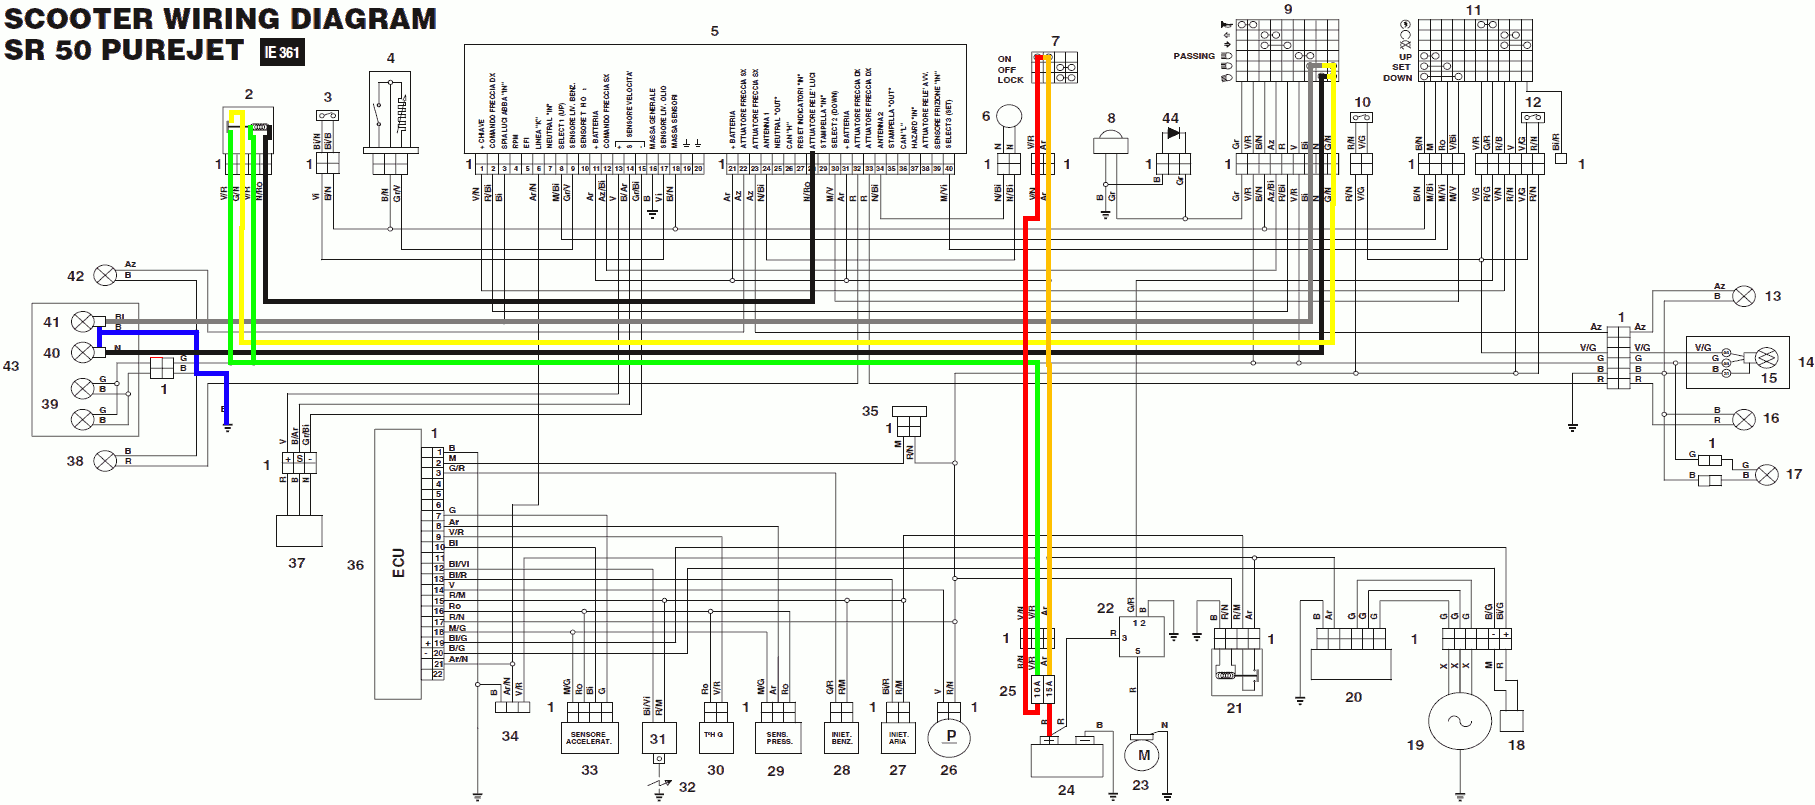 [WQZT_9871]  RY_1470] Aprilia Wiring Mod Free Diagram | Aprilia Pegaso 125 Wiring Diagram |  | Dylit Eatte Mohammedshrine Librar Wiring 101